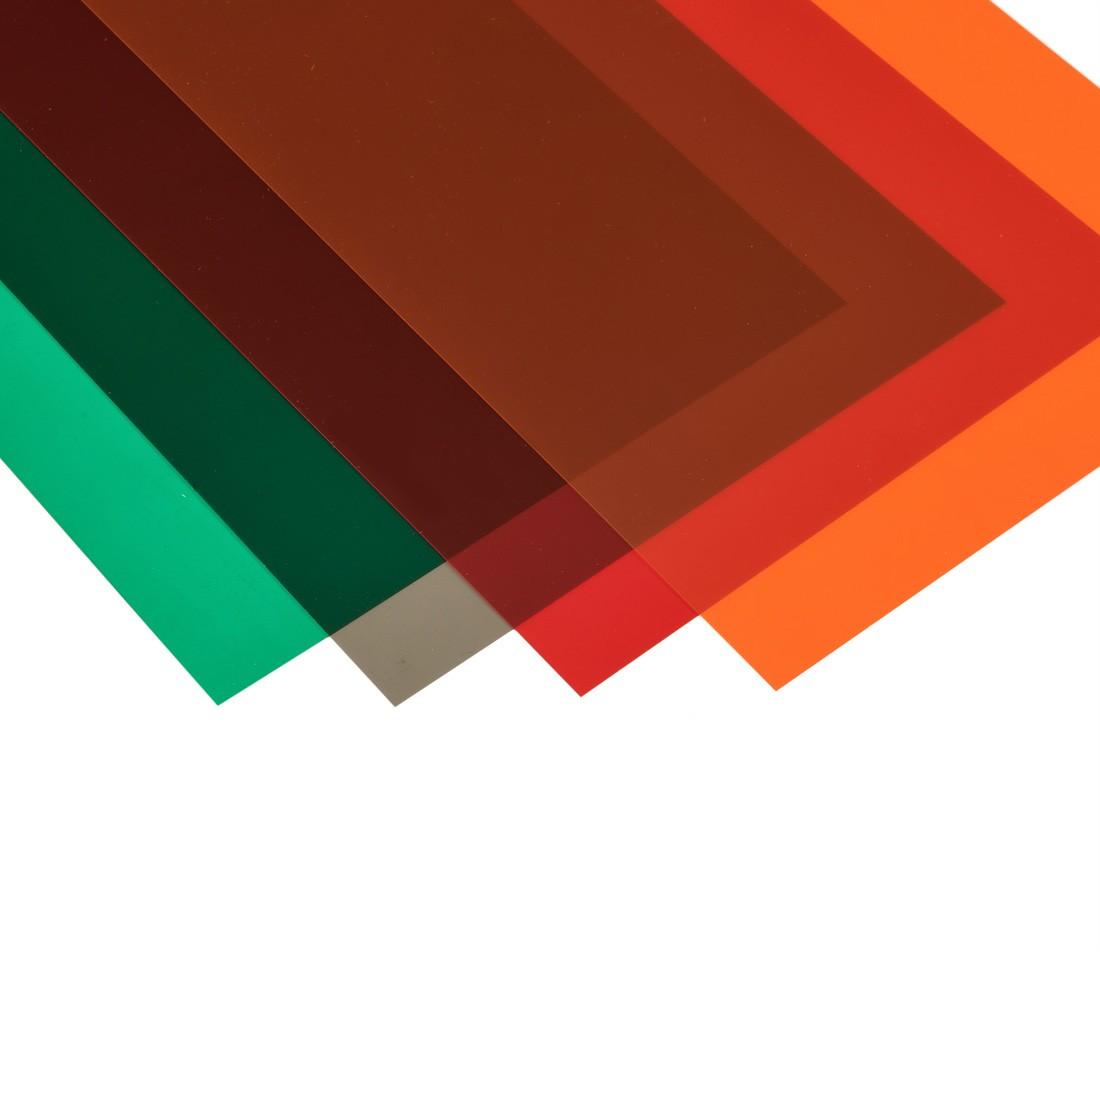 Lámina de PVC roja mm.194x320 mm.0,1